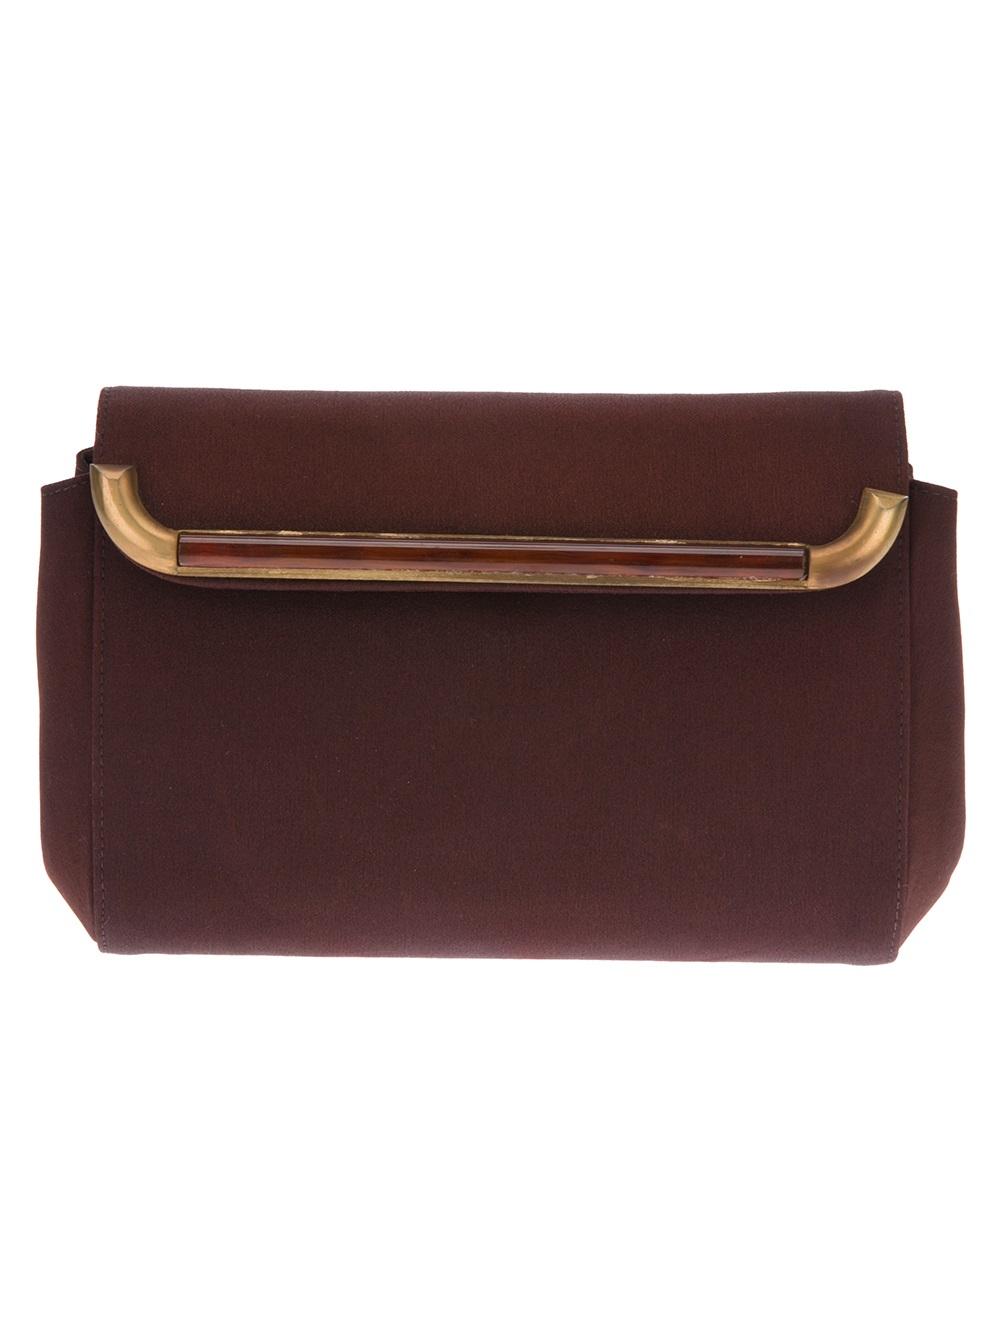 gucci vintage goldtone trim clutch bag in gold lyst